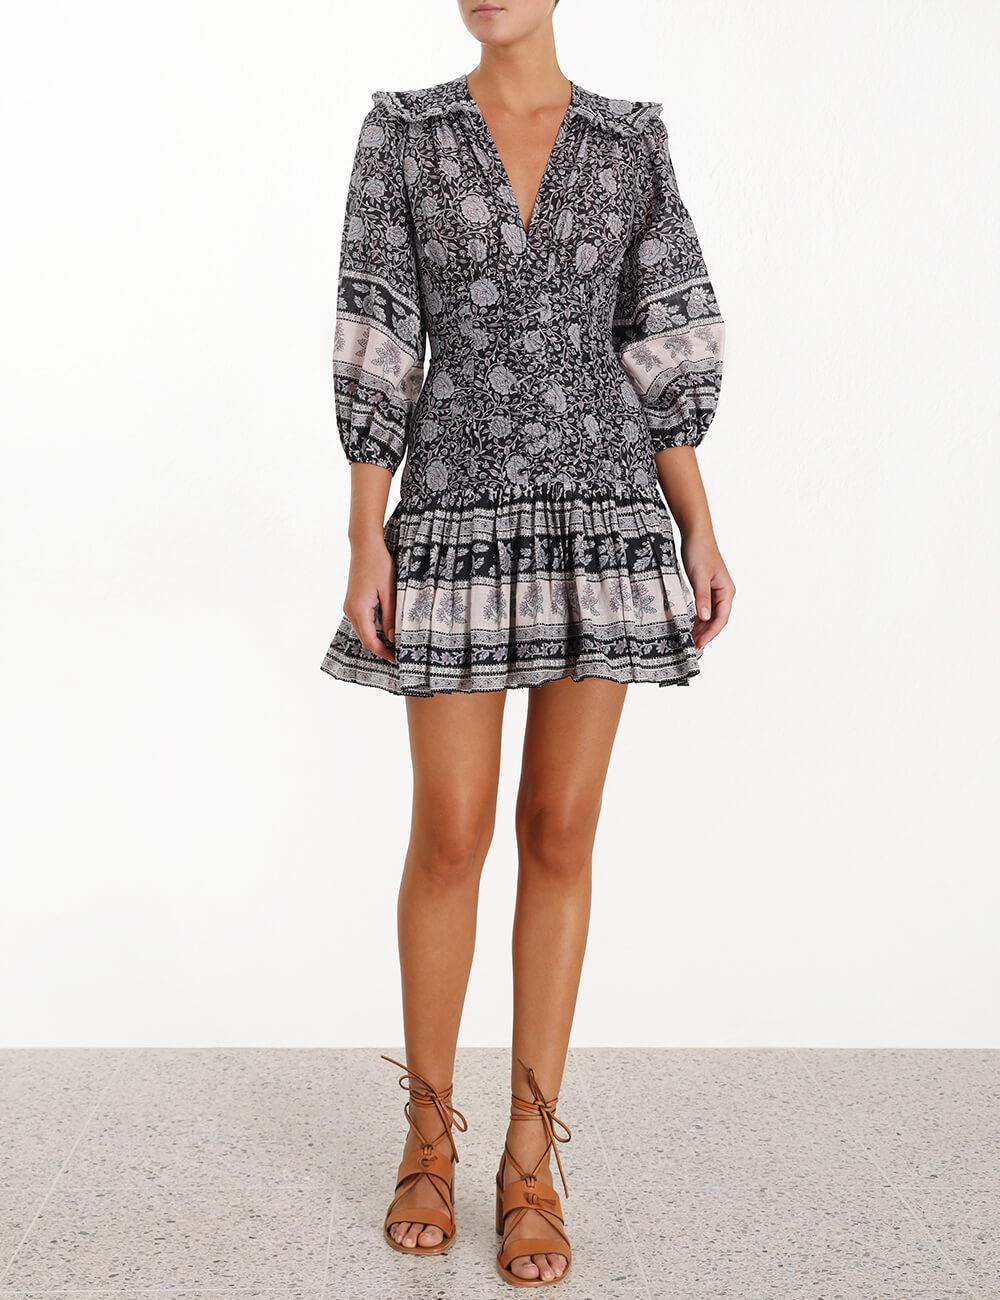 Amari Corset Short Dress